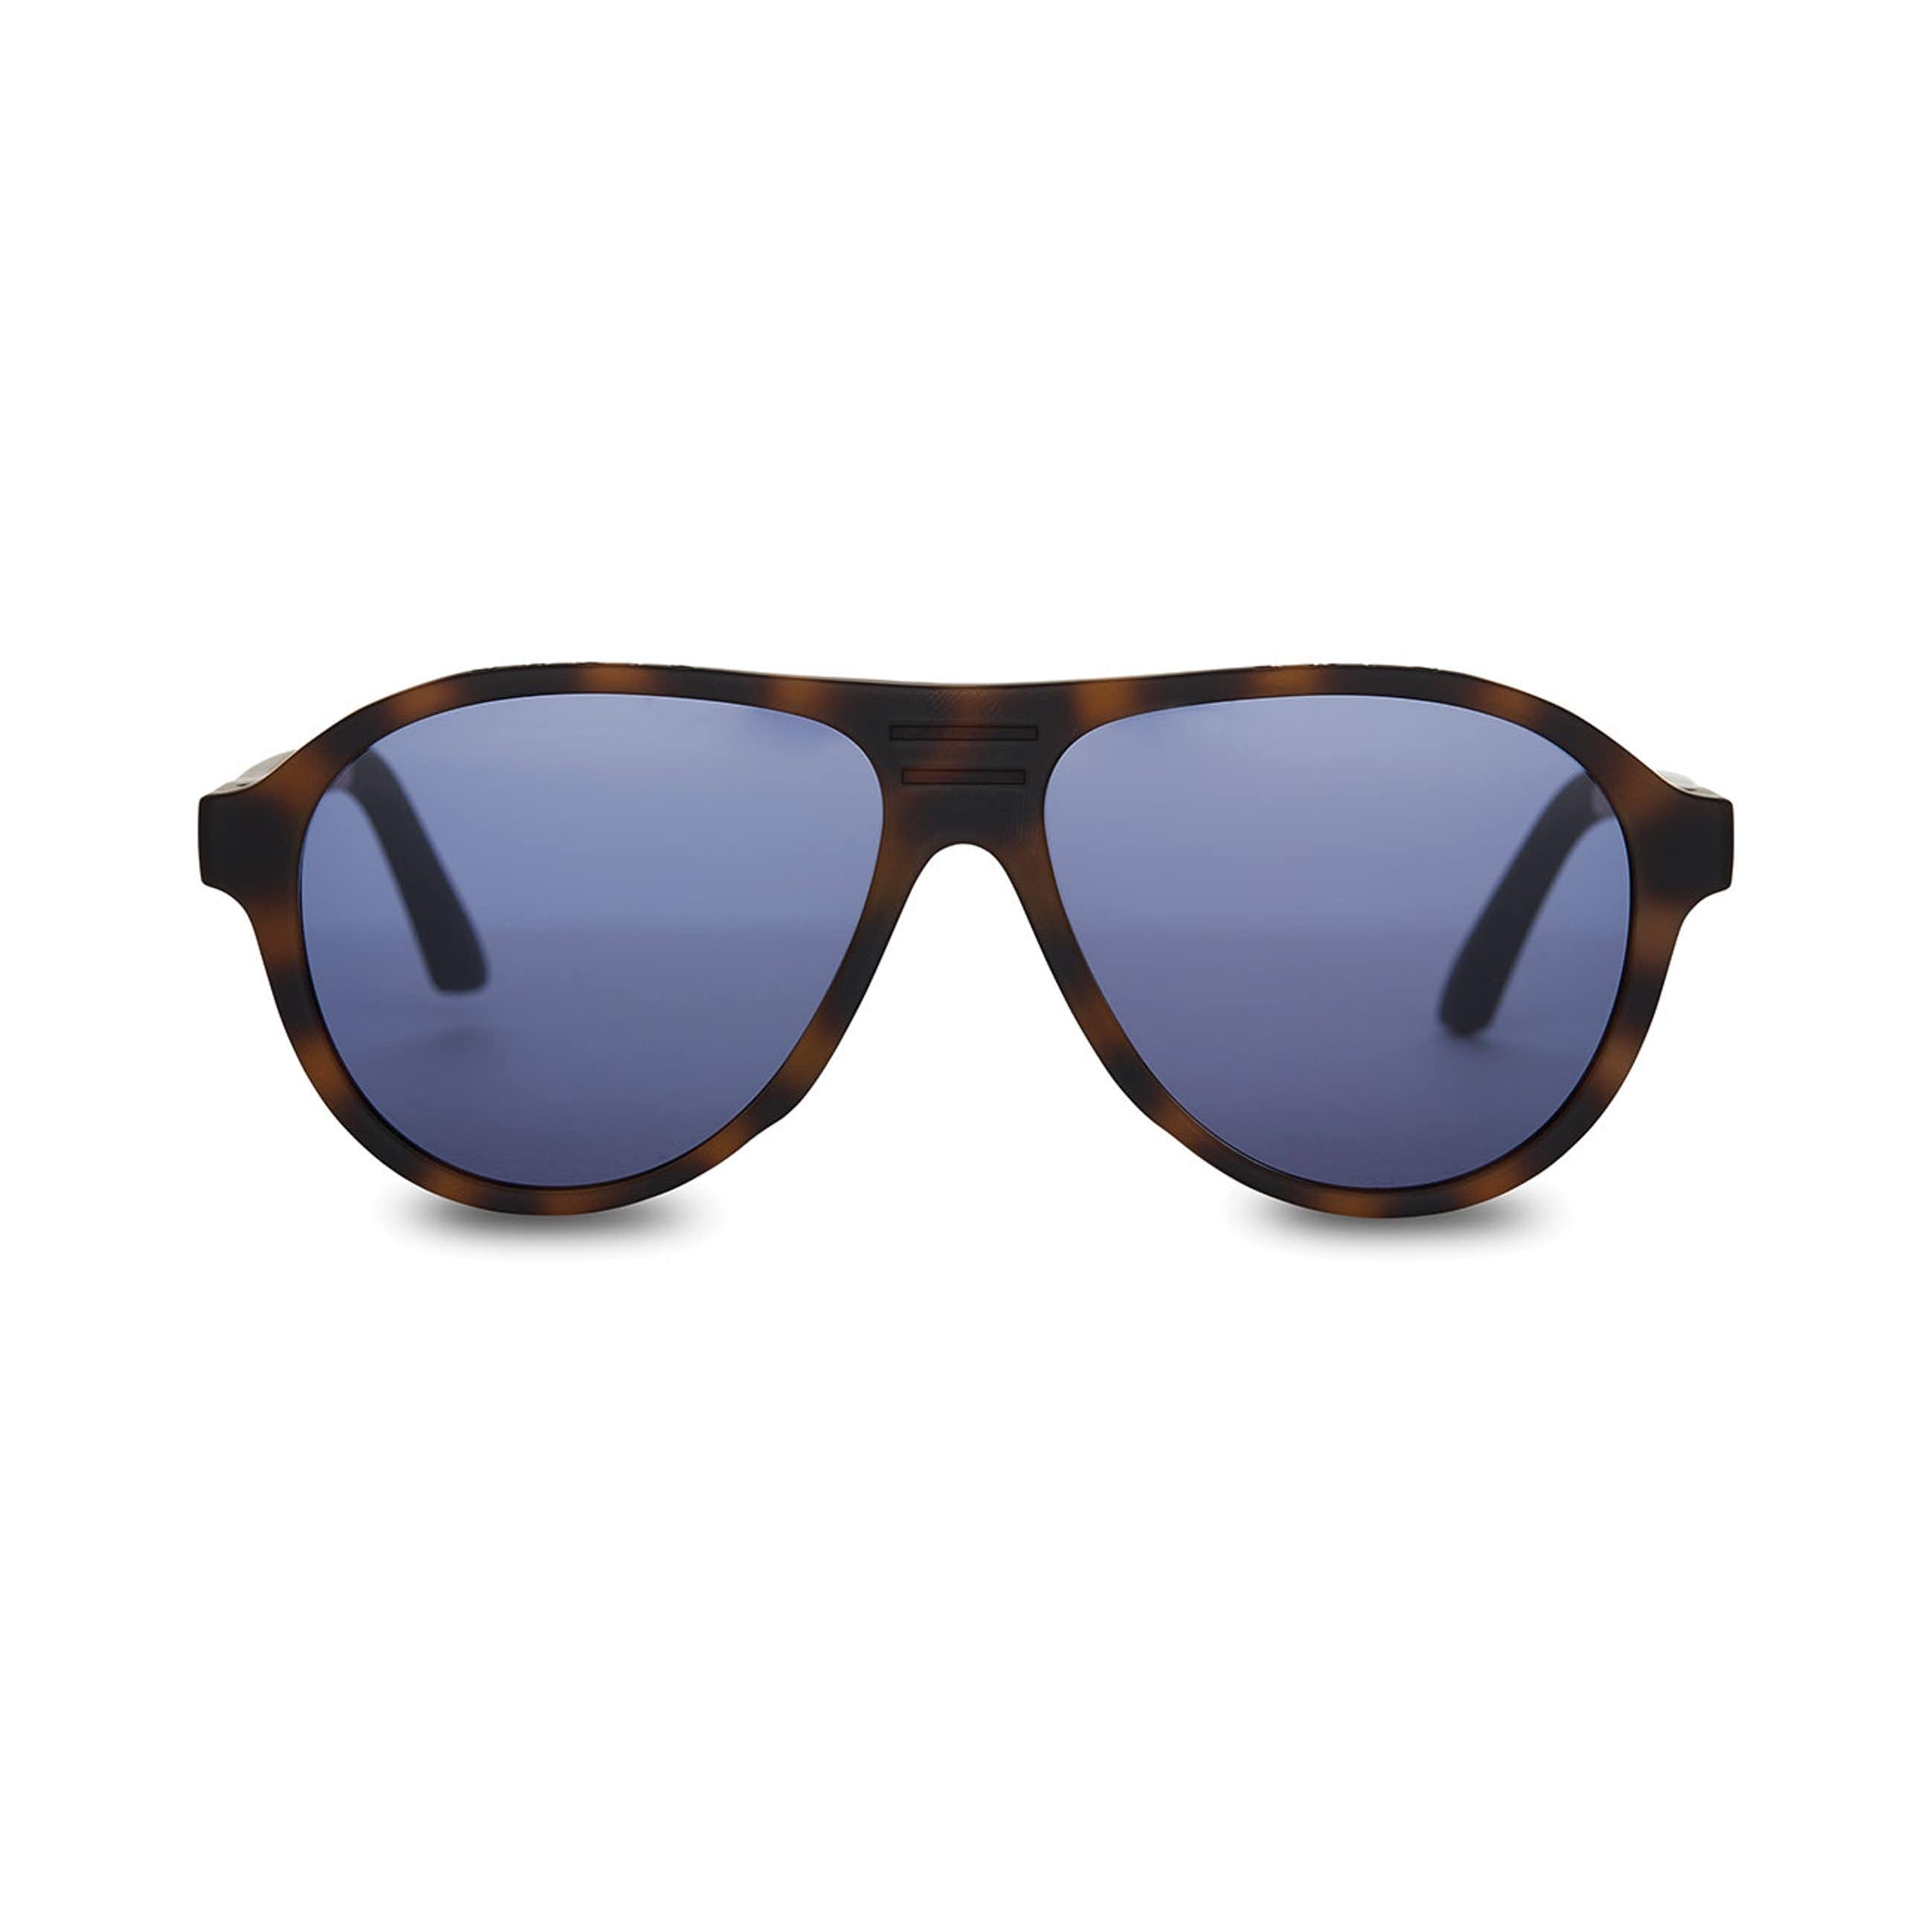 5a4cfe218626 Womens Sunglasses & Snow Goggles | Ladies Sunglasses | AU